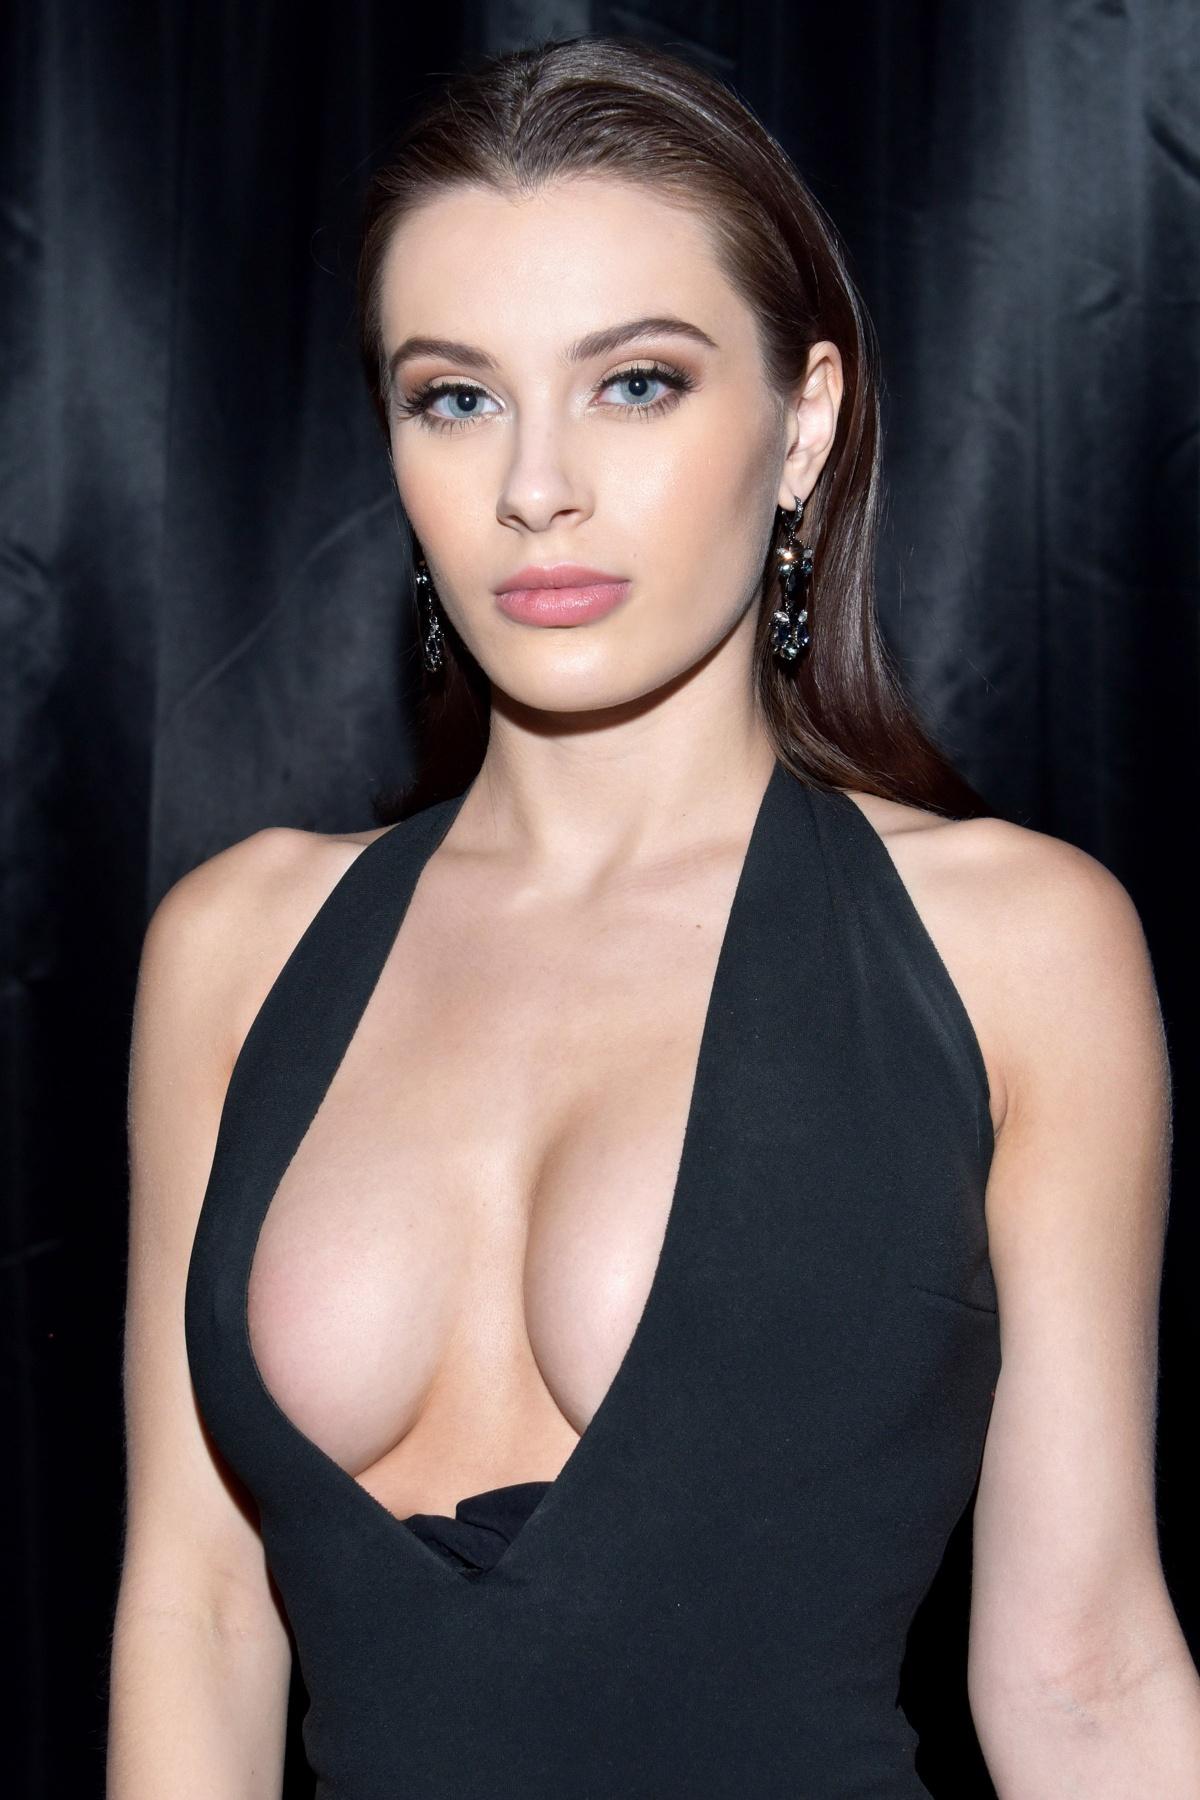 Lana rhoades porno